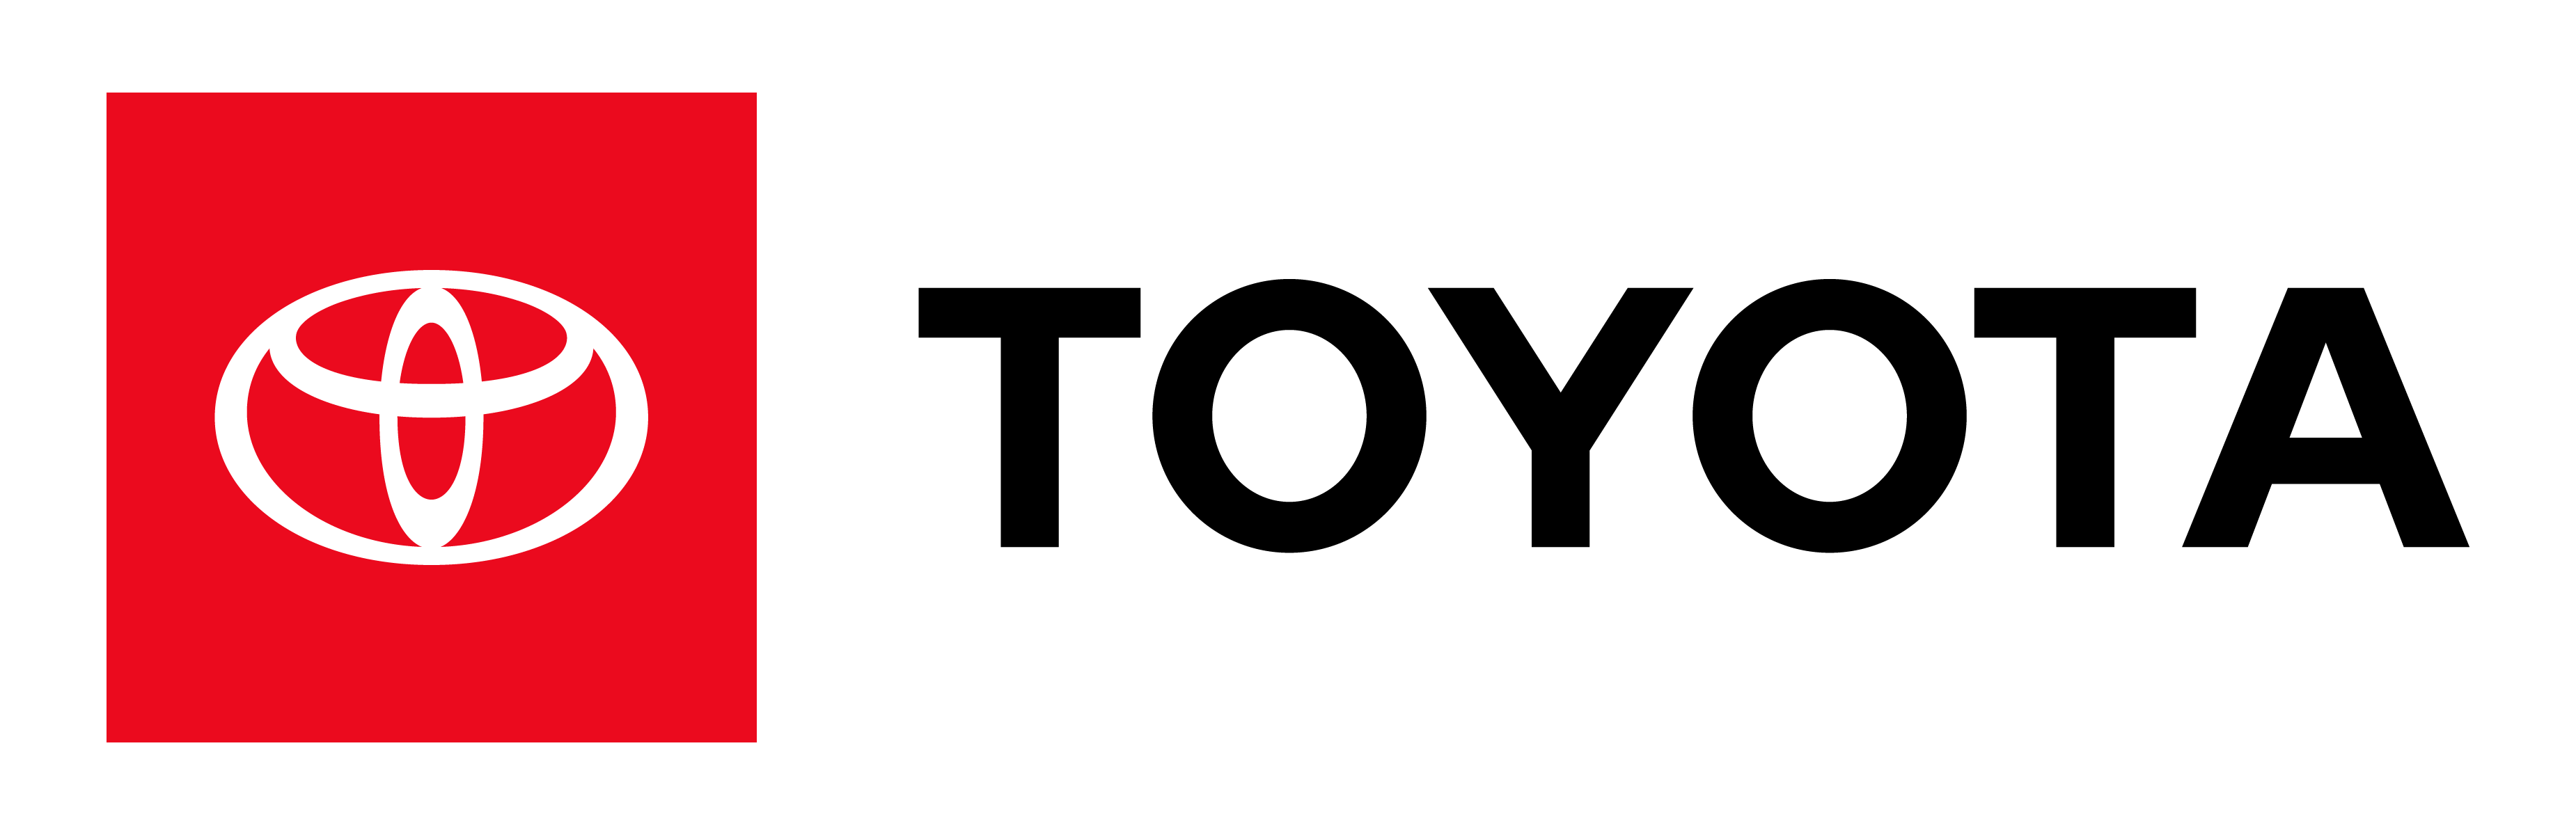 brand-1